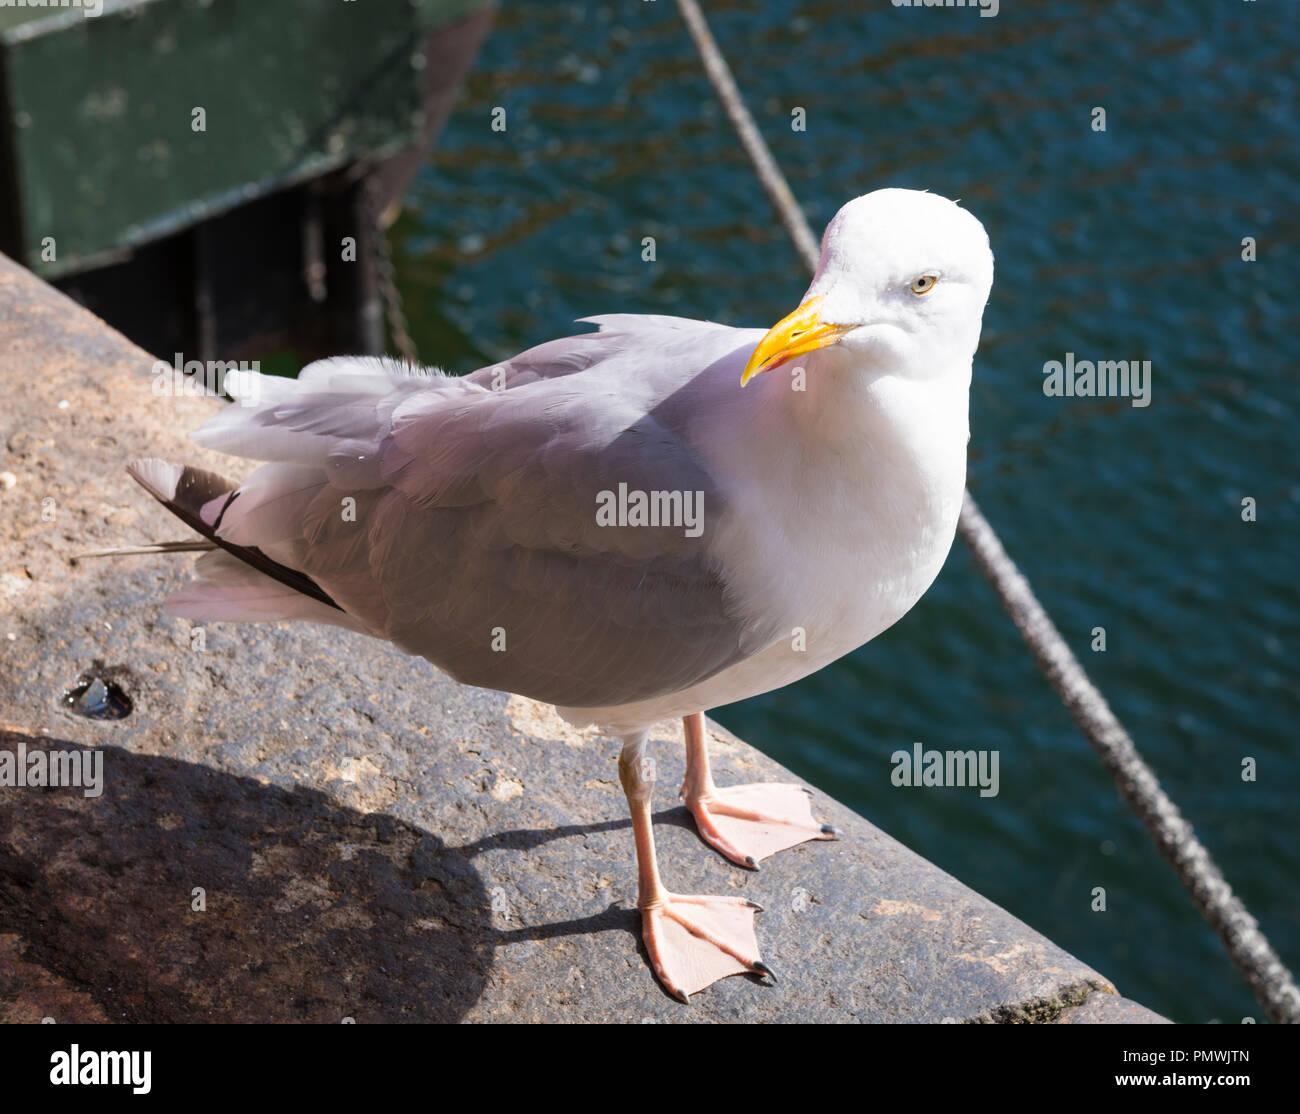 Liverpool Merseyside Albert Dock European Herring Gull Seagull Larus Argentus basking in sun on dockside water - Stock Image